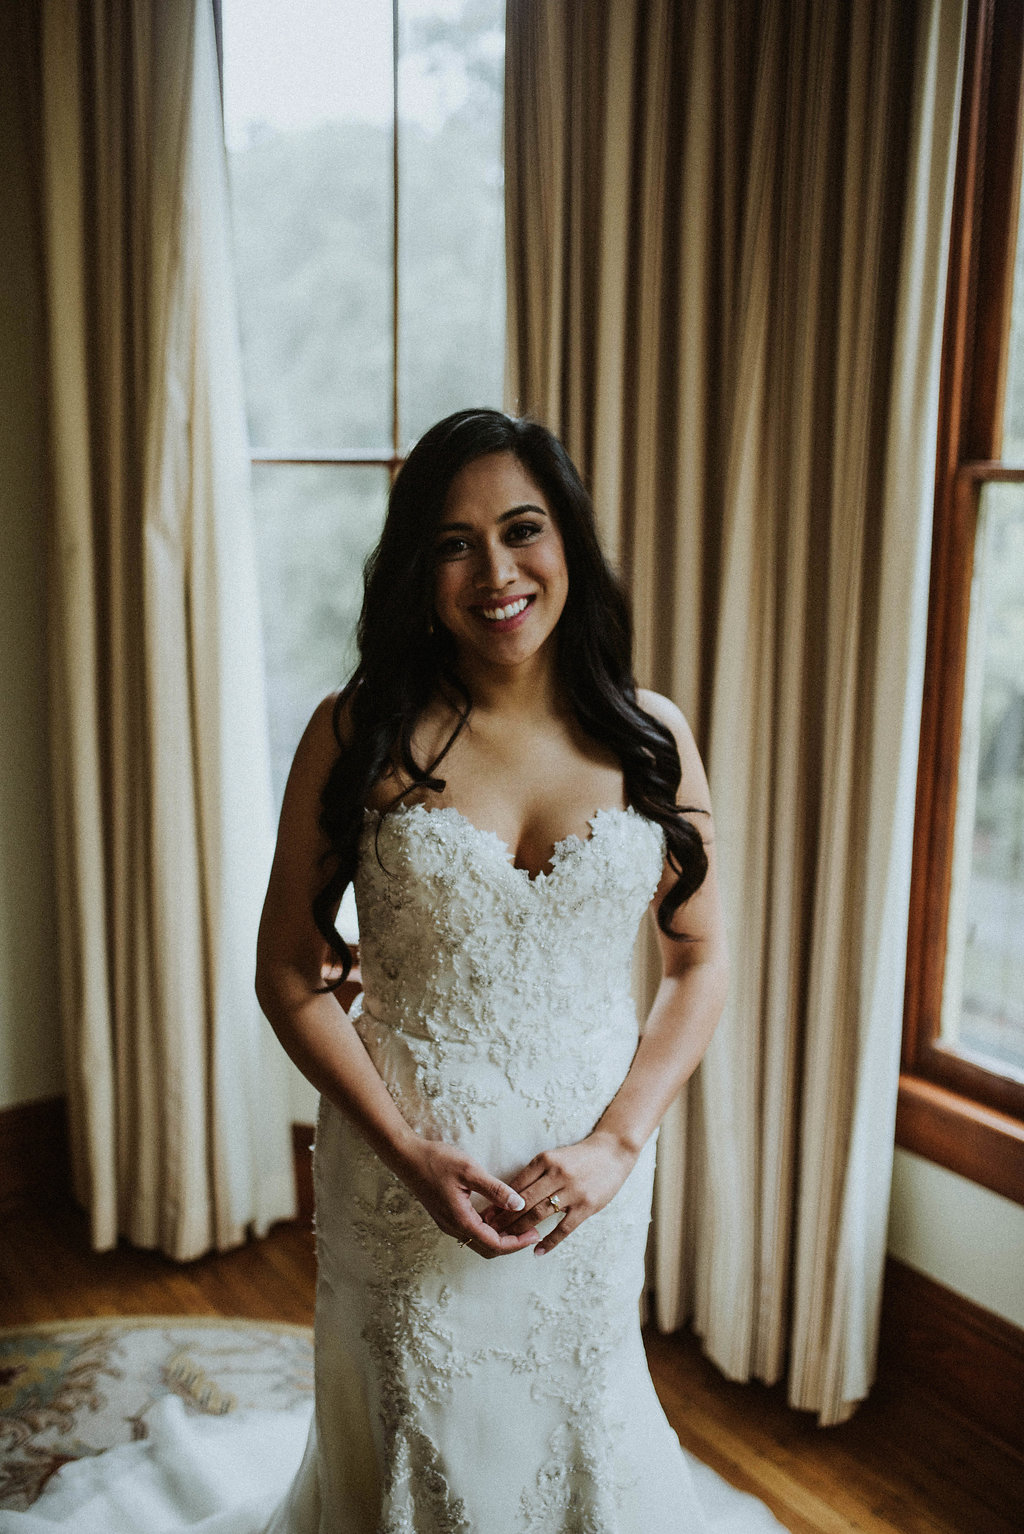 ivory-and-beau-bridal-boutique-alex-and-josephine-meghan-melia-photography-brockington-hall-wedding-savannah-wedding-7.jpg